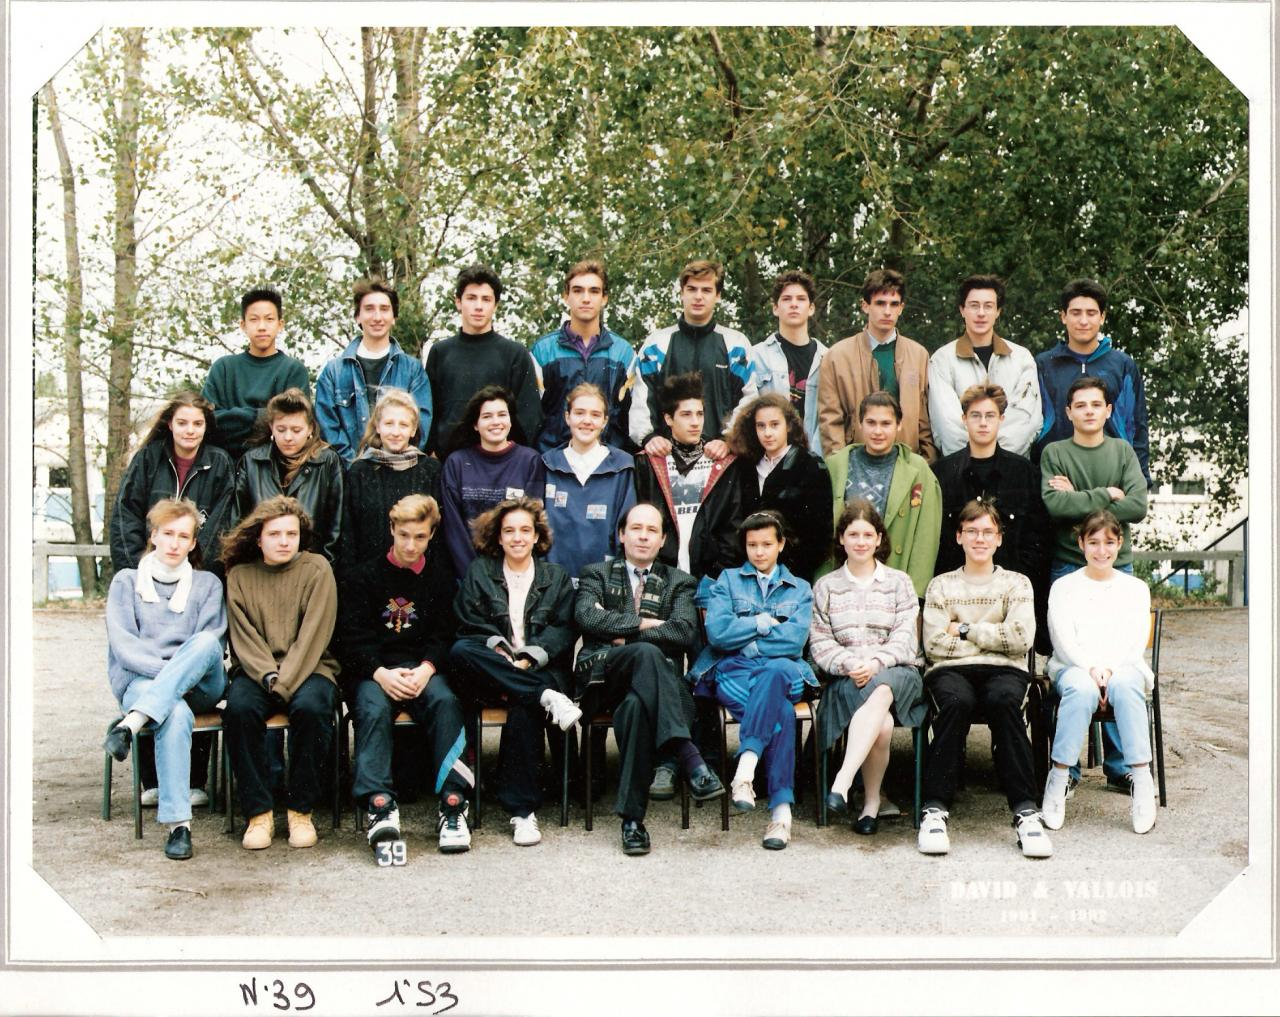 1992 - 1S3